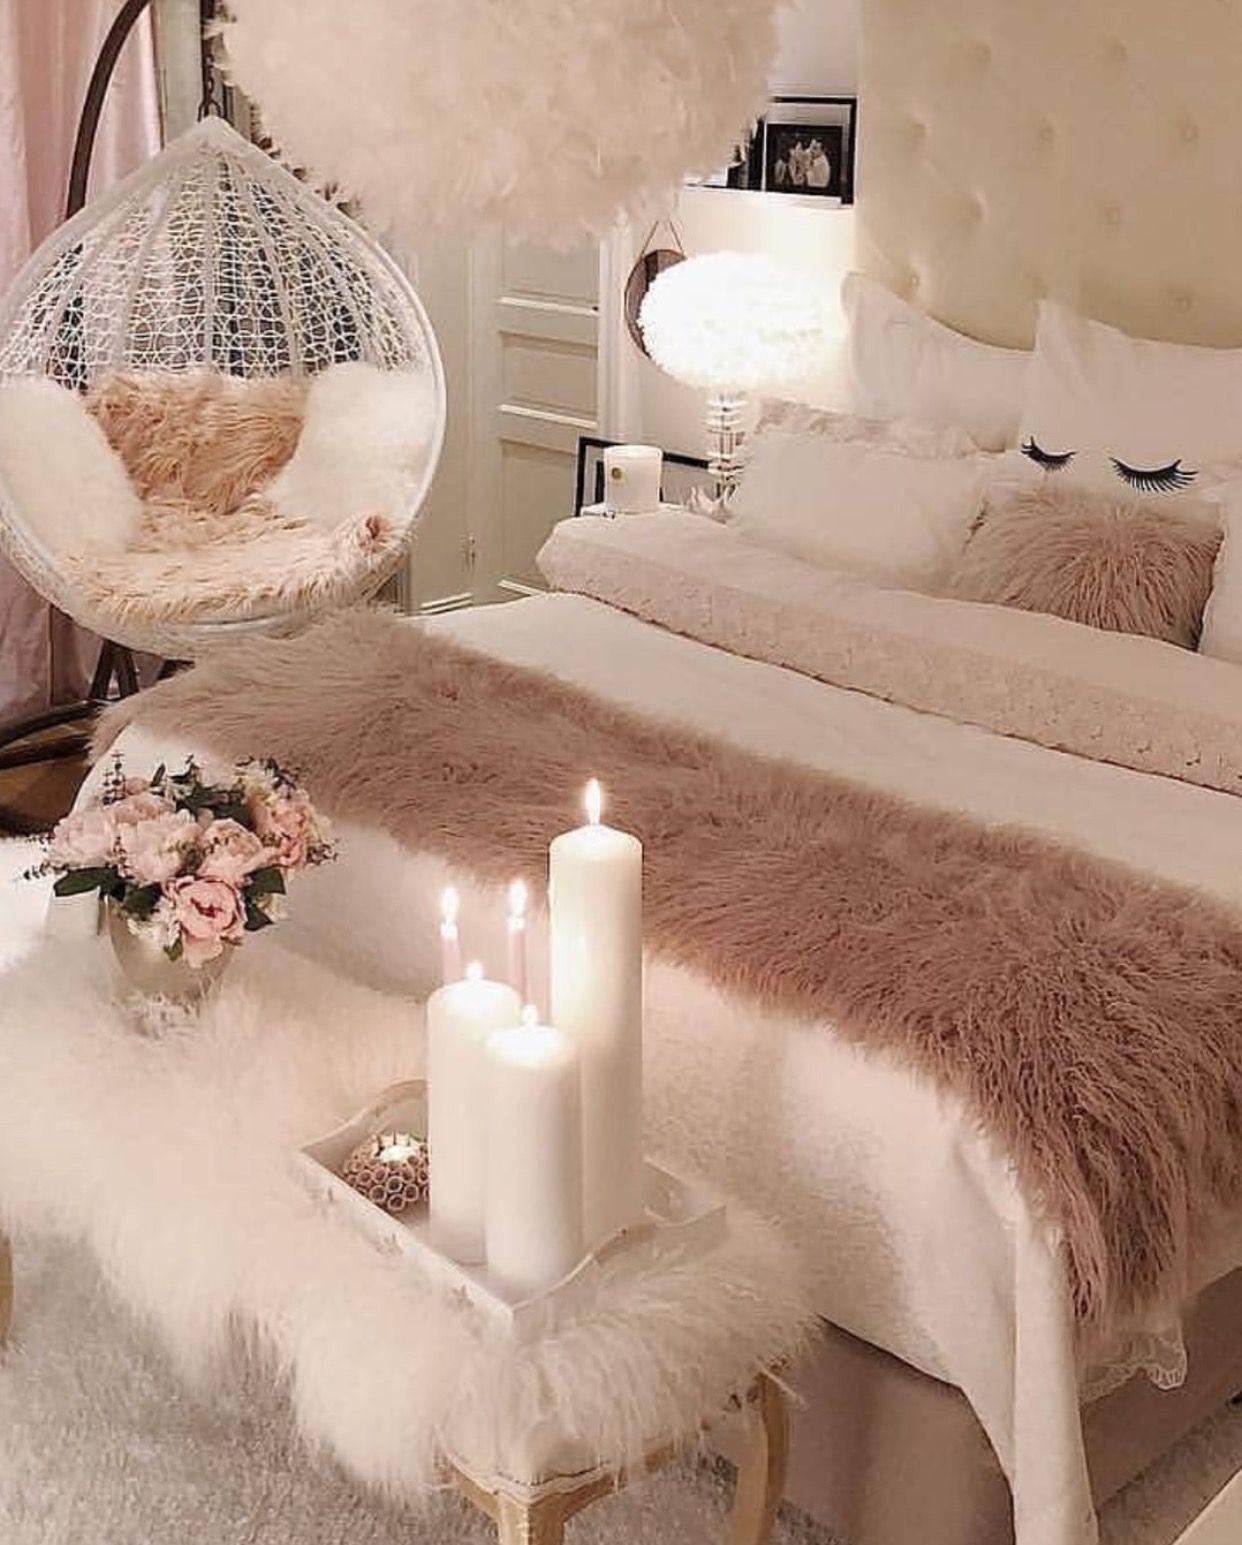 Bedroom Ideas ديكور وتصاميم غرف نوم بنات Just4girls Bedroomideas Smallbedroomdesigns Apartmen Feminine Bedroom Feminine Bedroom Decor Small Room Bedroom